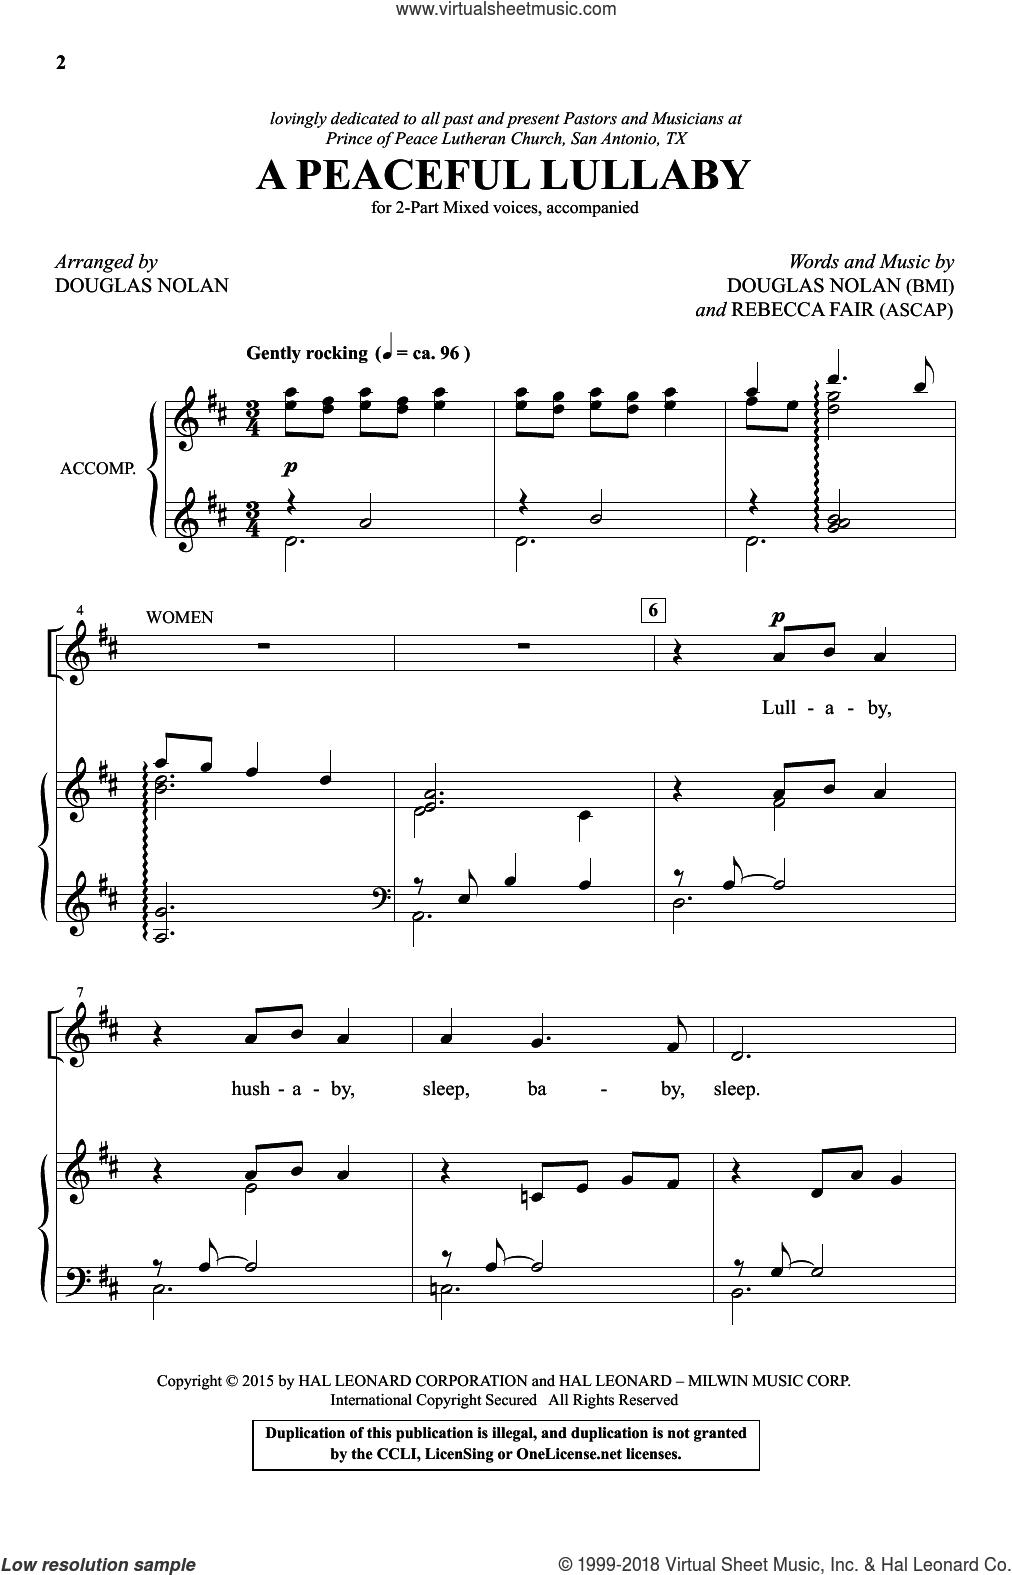 A Peaceful Lullaby sheet music for choir (2-Part) by Douglas Nolan and Rebecca Fair, intermediate duet